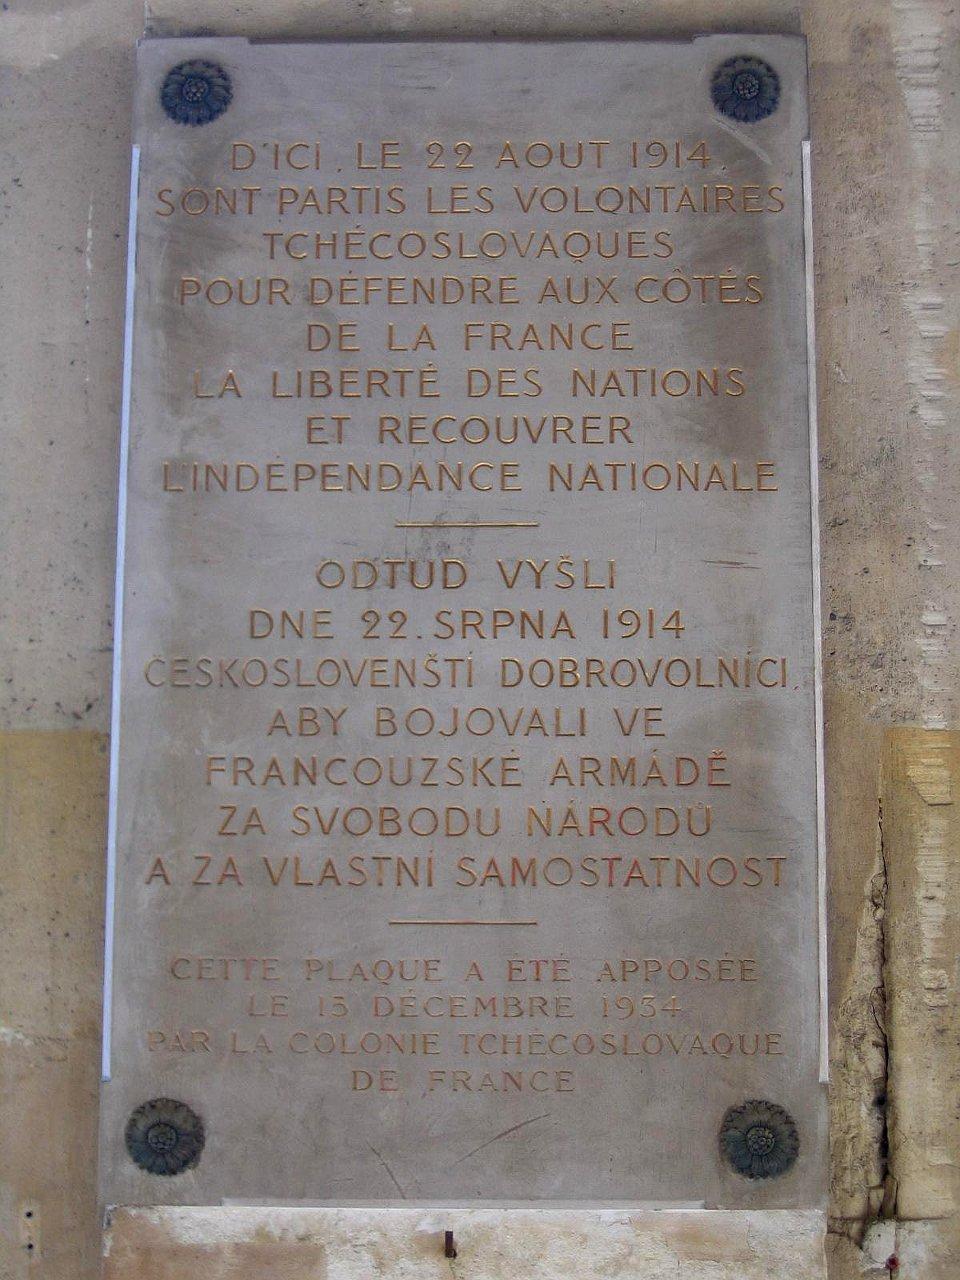 http://img.radio.cz/pictures/c/historie/1_sv_valka_cesi_francie/pametni_deska_palais_royal_1934.jpg